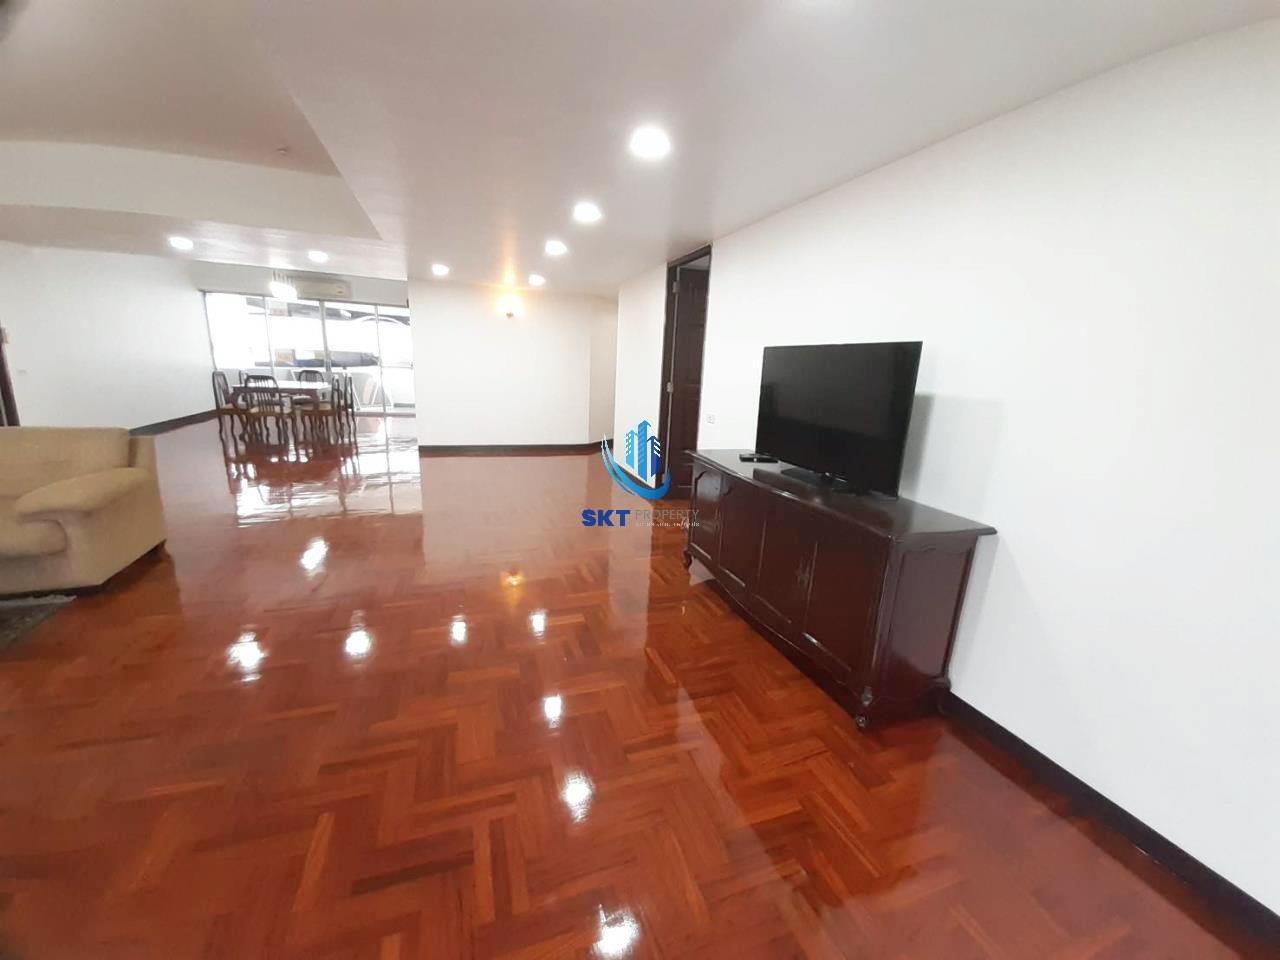 Sukritta Property Agency's Kanta mansion sukhumvit 26 - Bts Prompong 2